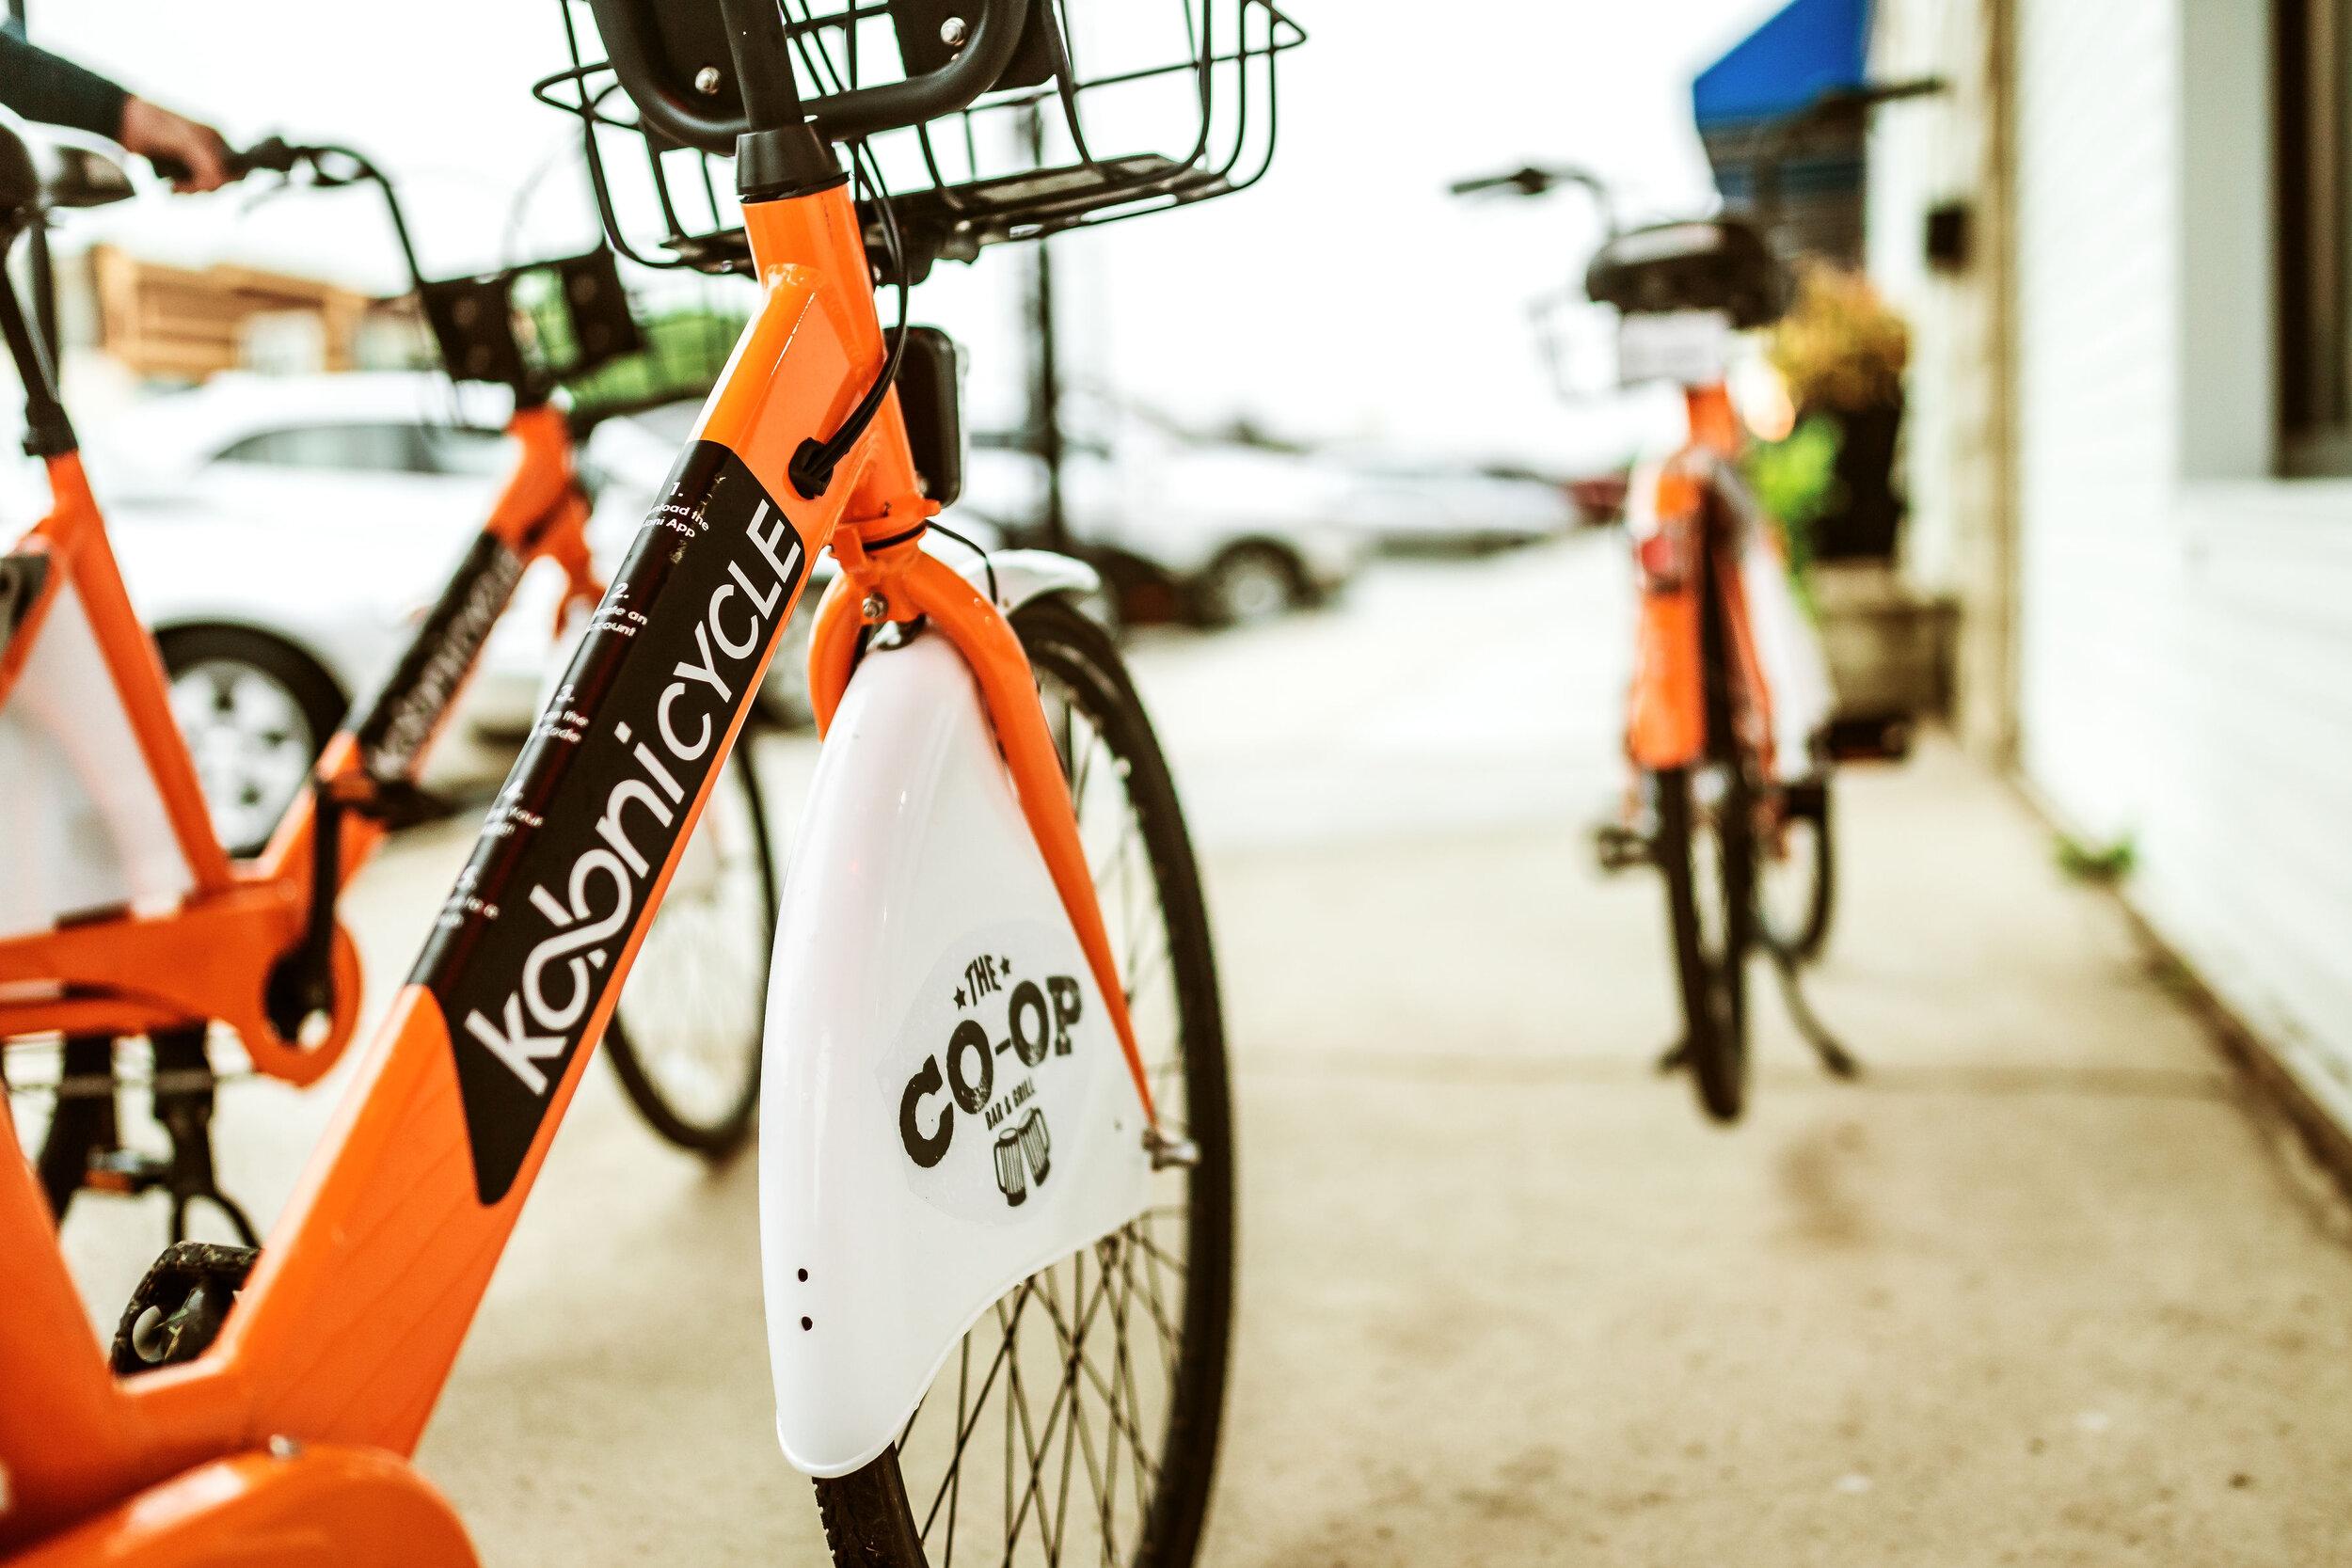 On-Bike Advertising  - Often pays for your entire program.